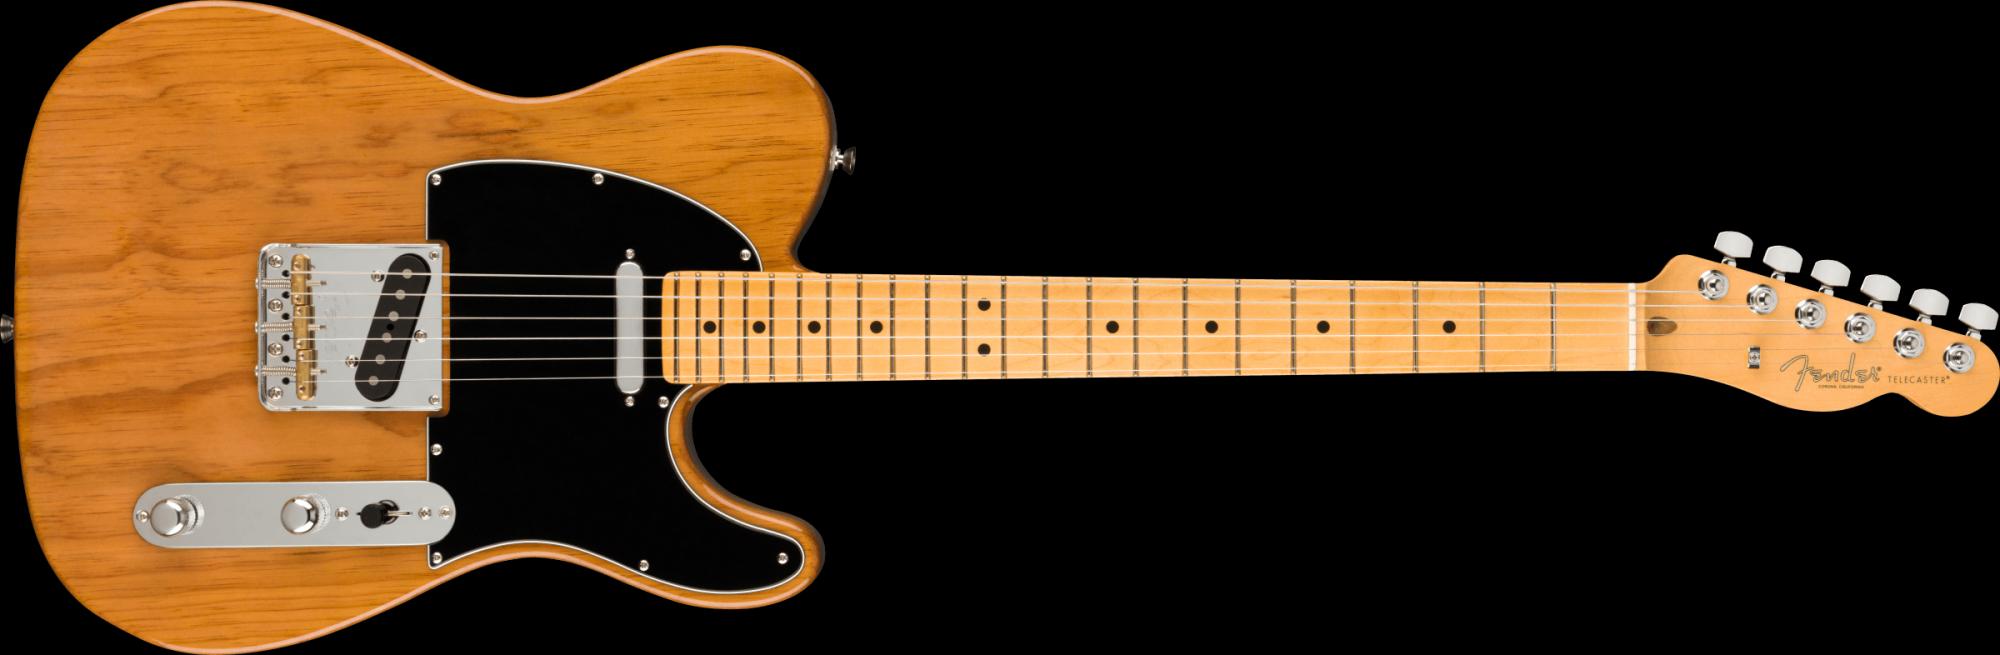 Fender American Professional II Telecaster, Maple Neck